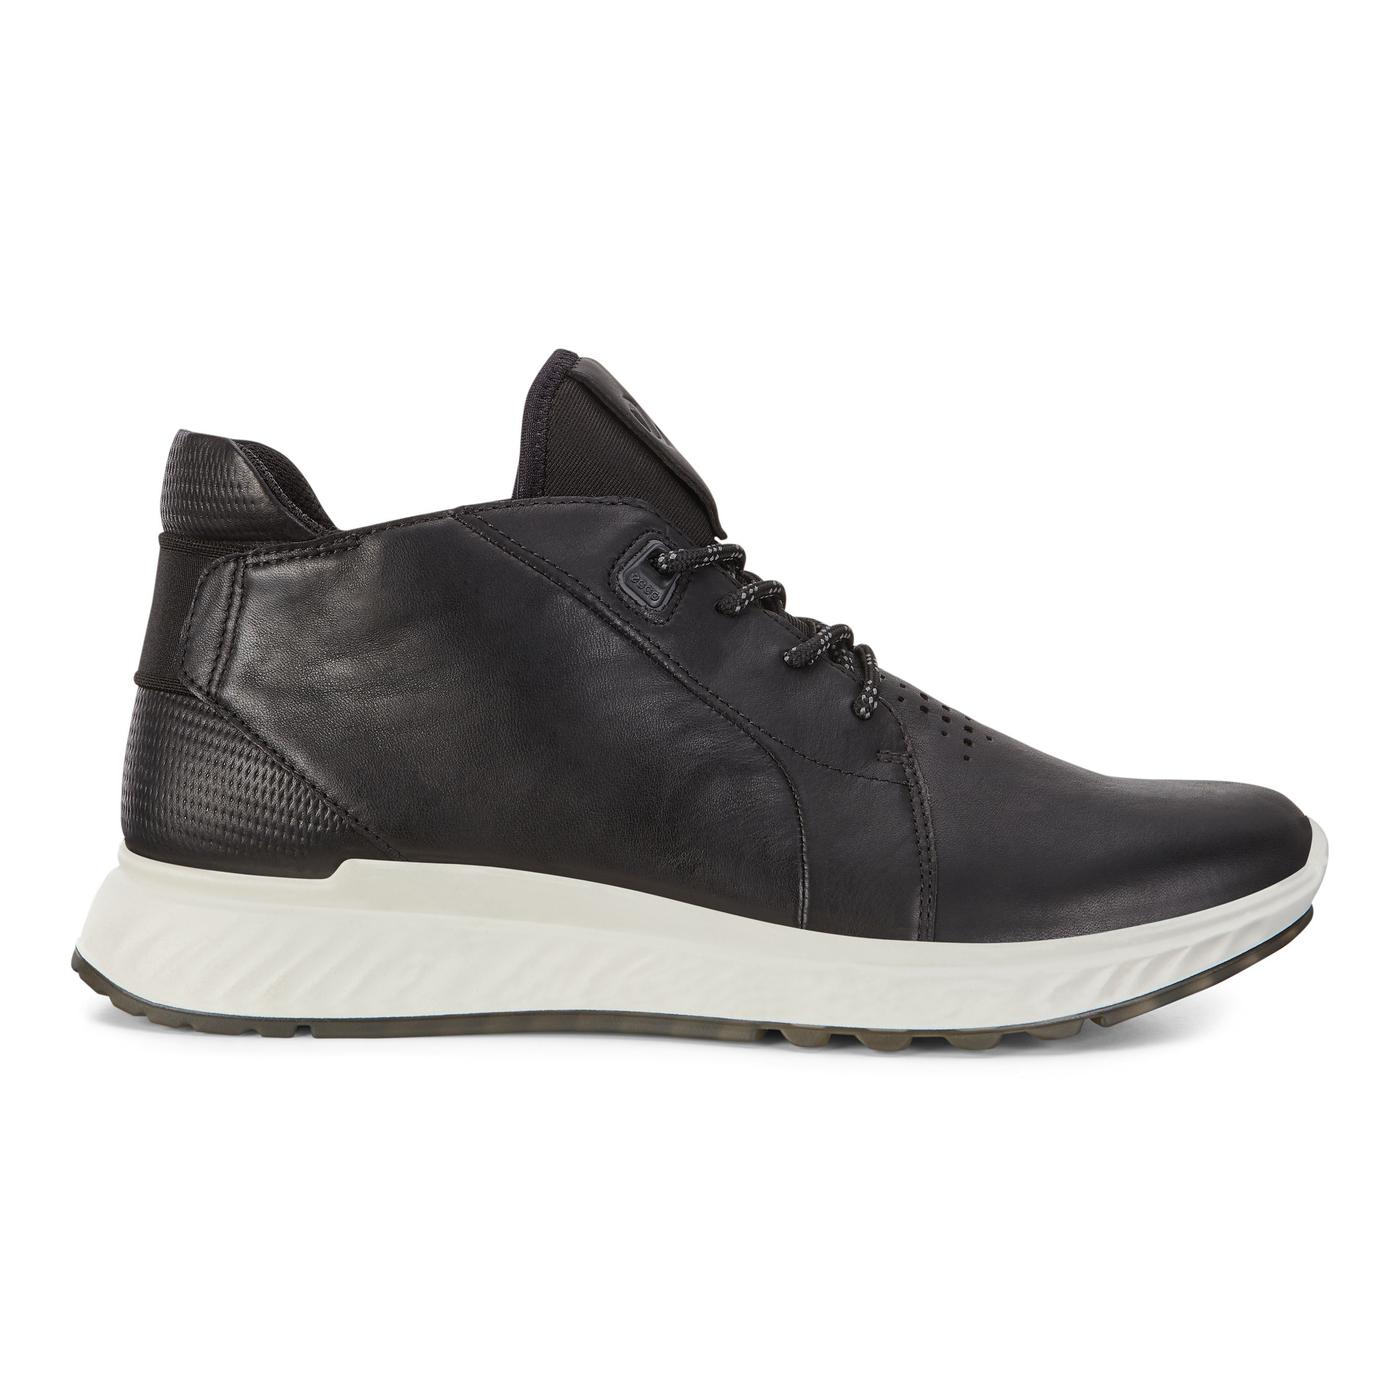 ECCO ST.1 Mens Mid Cut Sneaker Tie